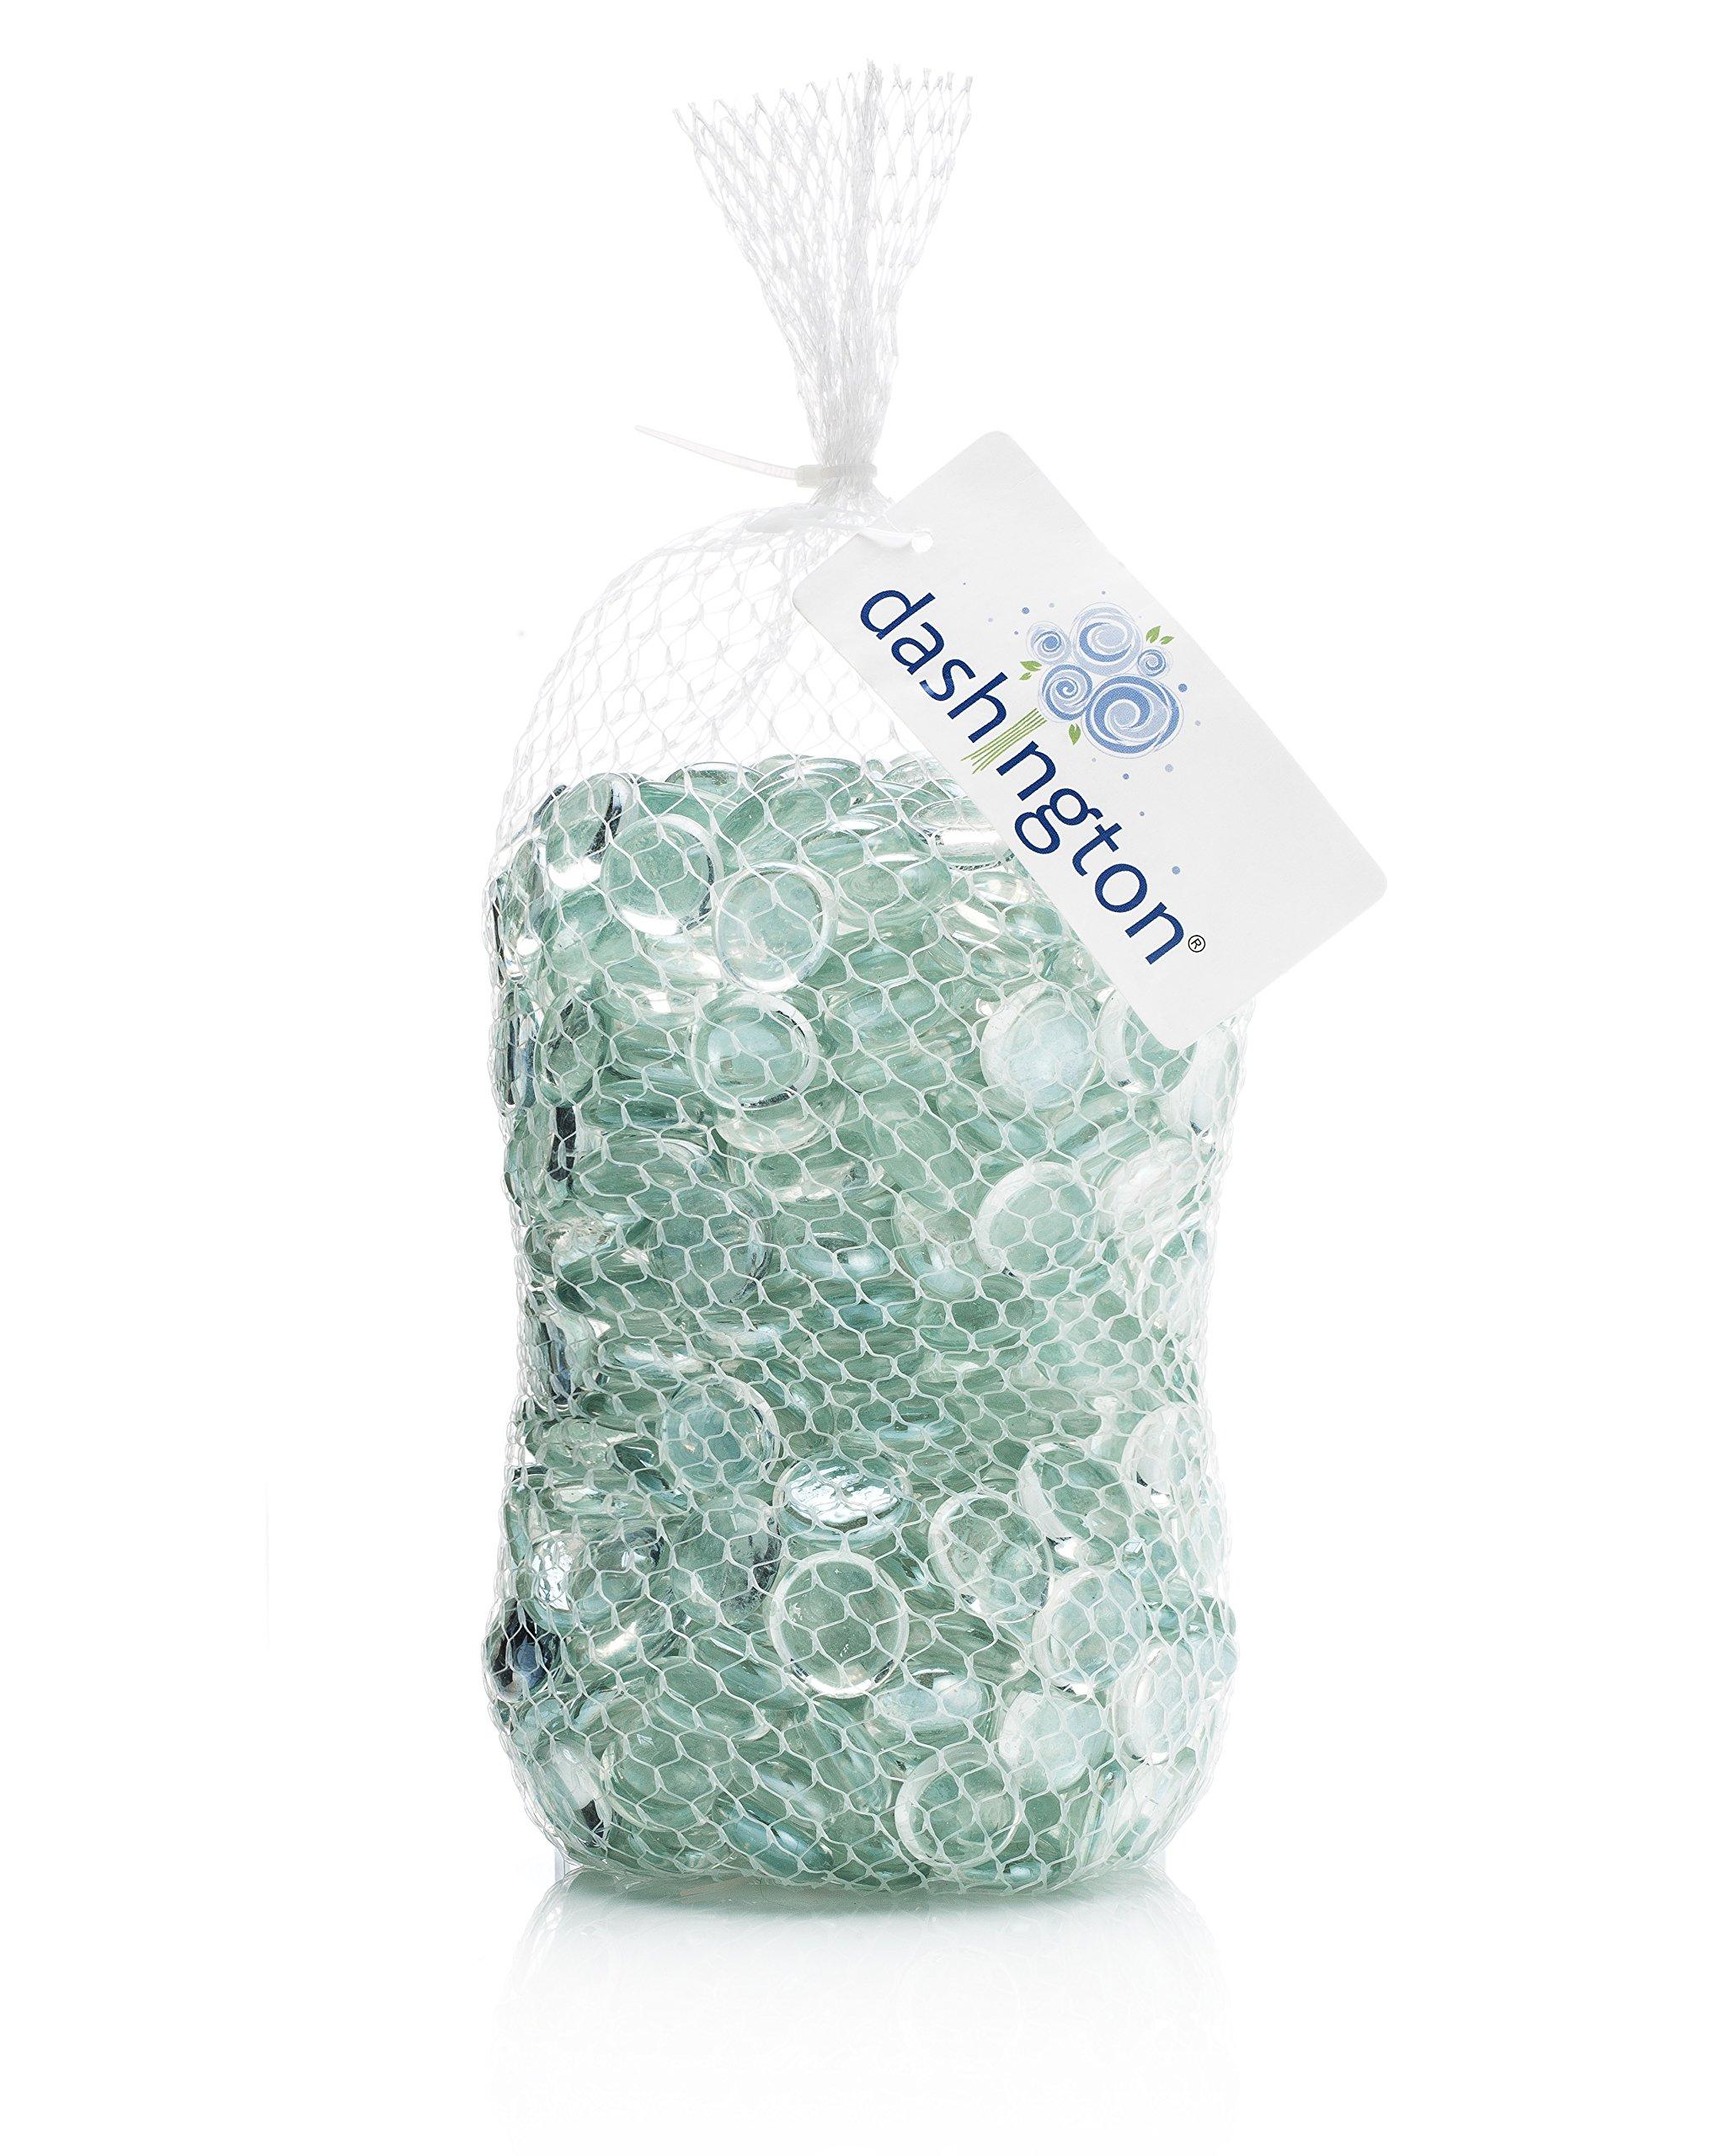 Dashington Flat Rainbow Clear (iridescent) Gems, Pebbles (5 Pound Bag) for Vase Filler, Table Scatter, Aquarium Decor Gravel Accent - New Packaging